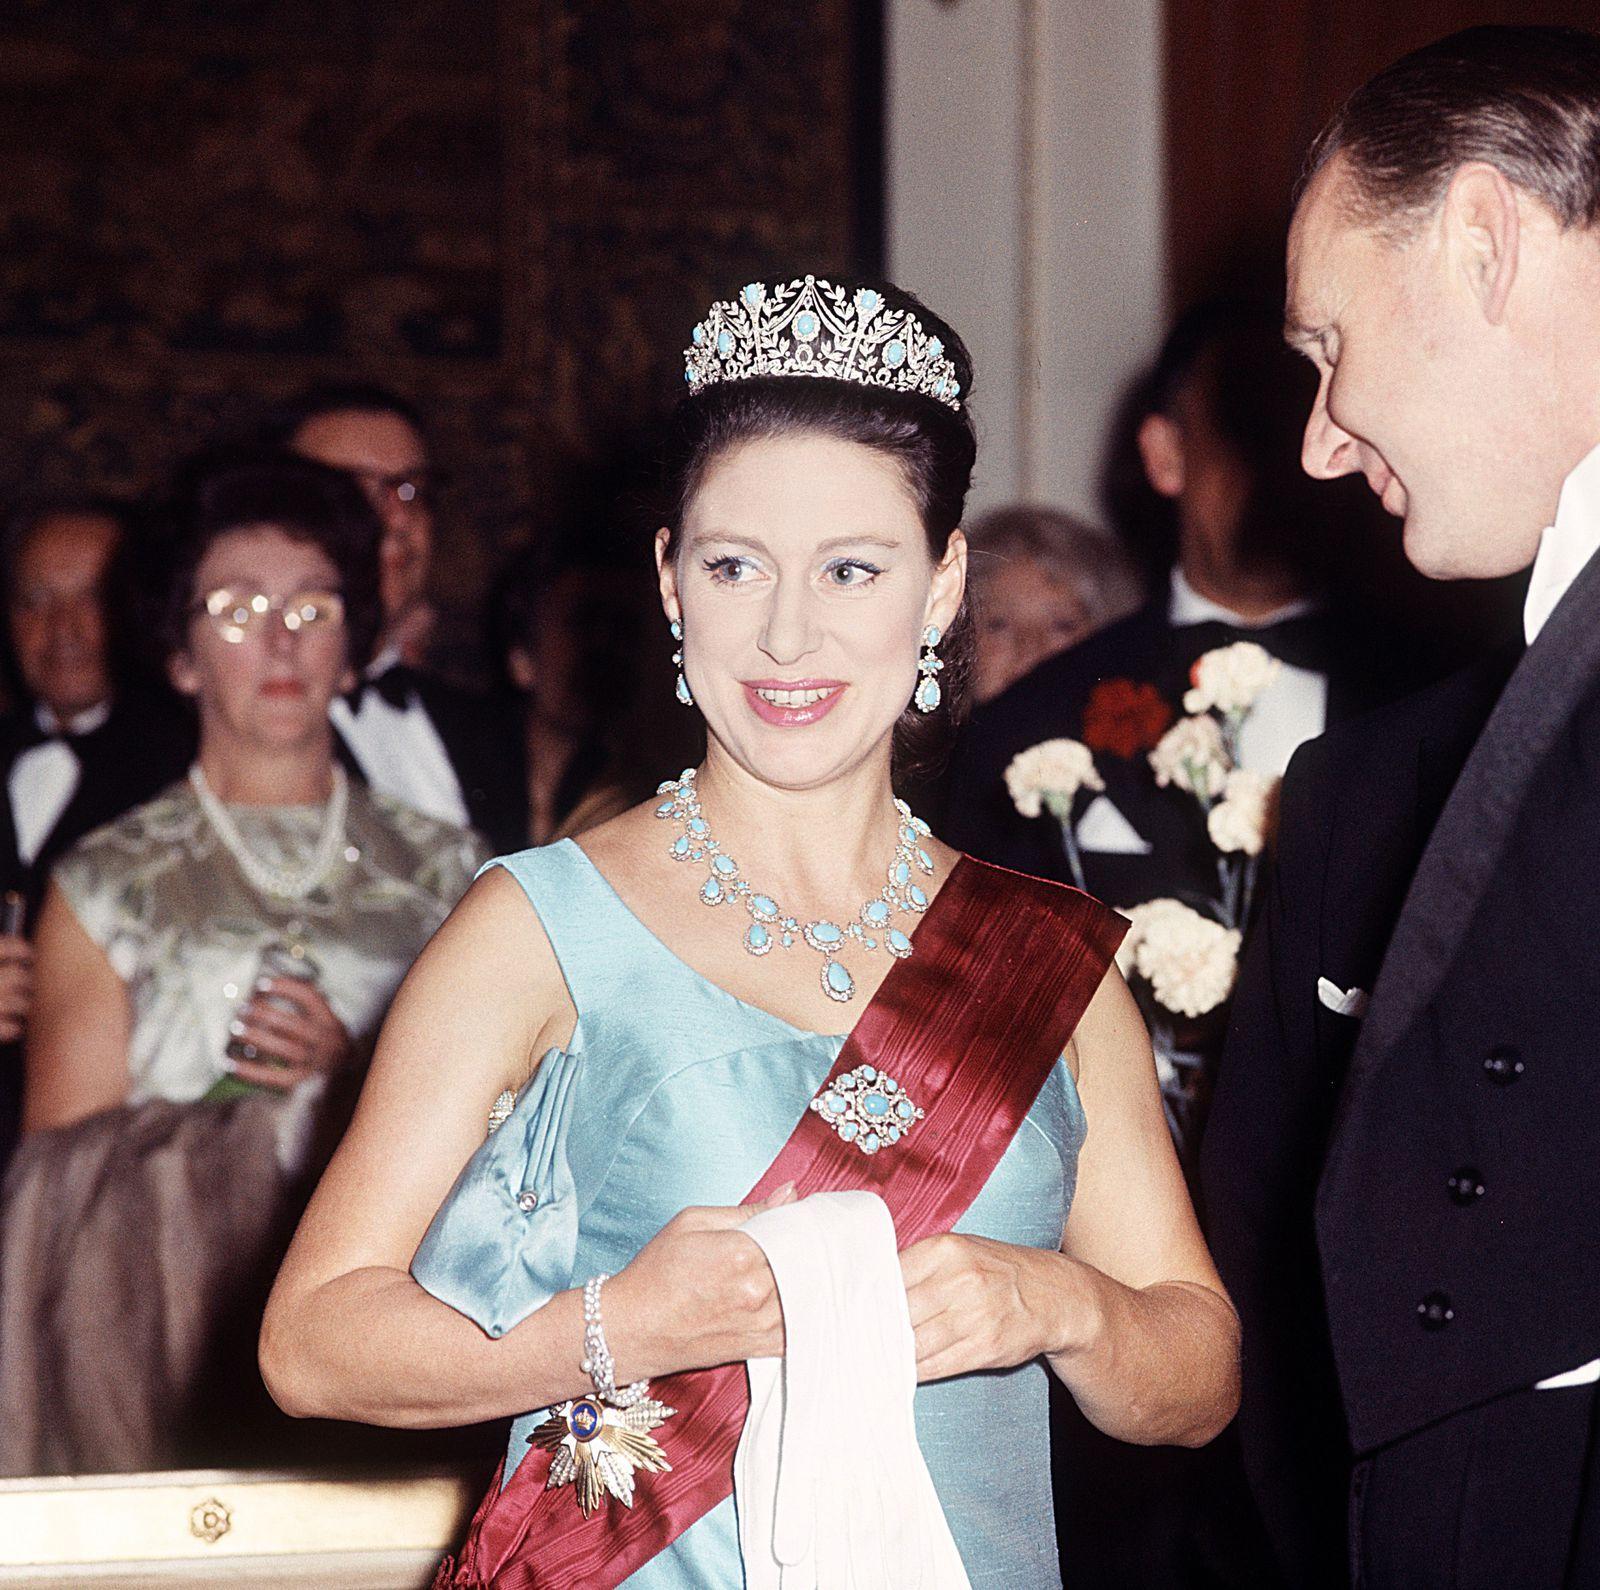 Princesa Margaret_Tiara Triumph of Love